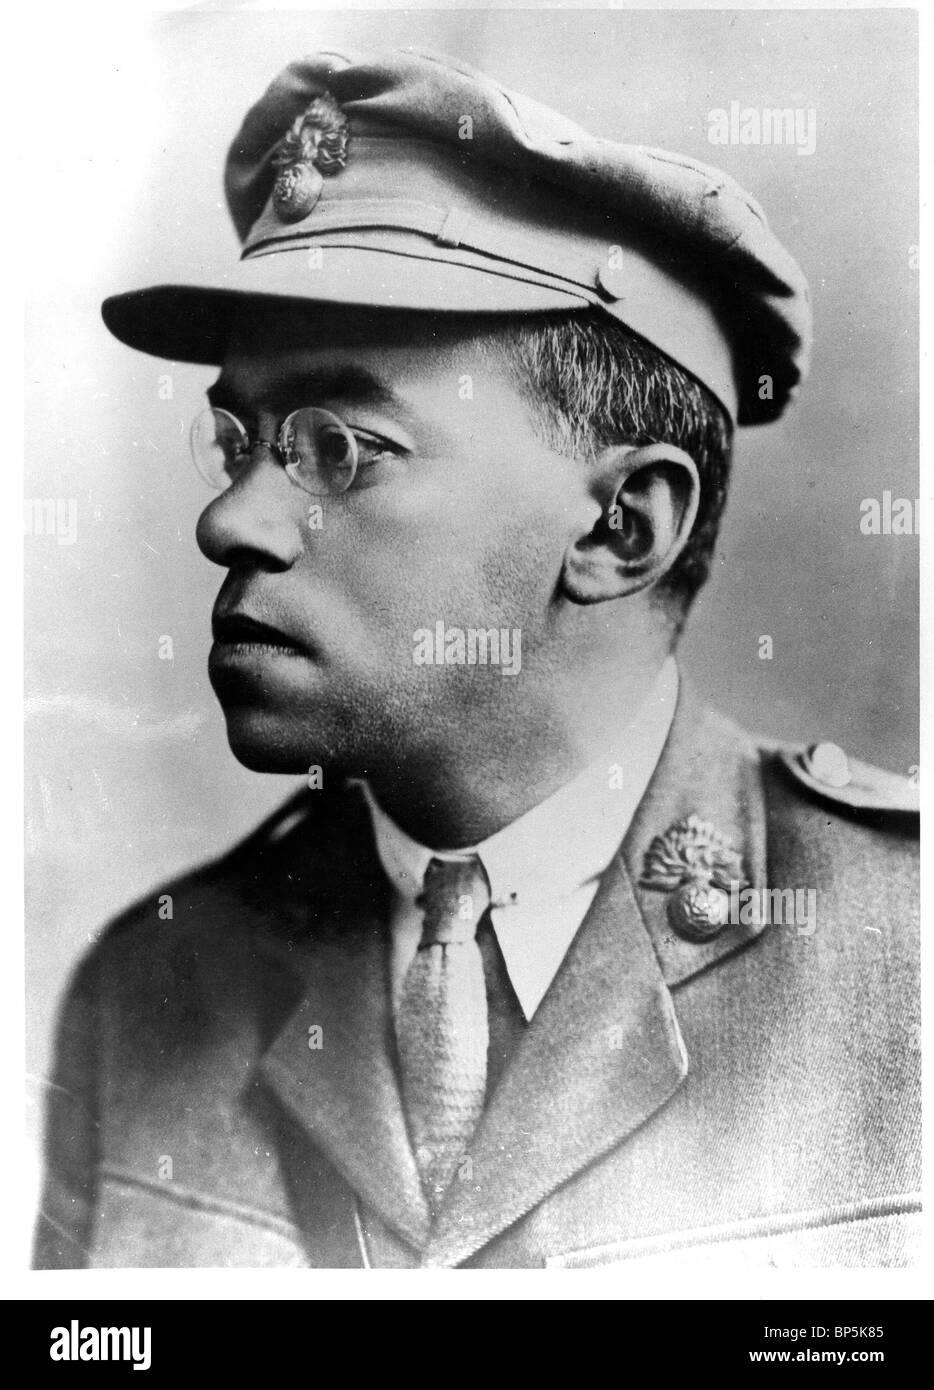 Jabotinsky Vladimir, 1880û1940 Jewish Zionist leader b. Russia. A fiery orator & an accomplished writer - Stock Image